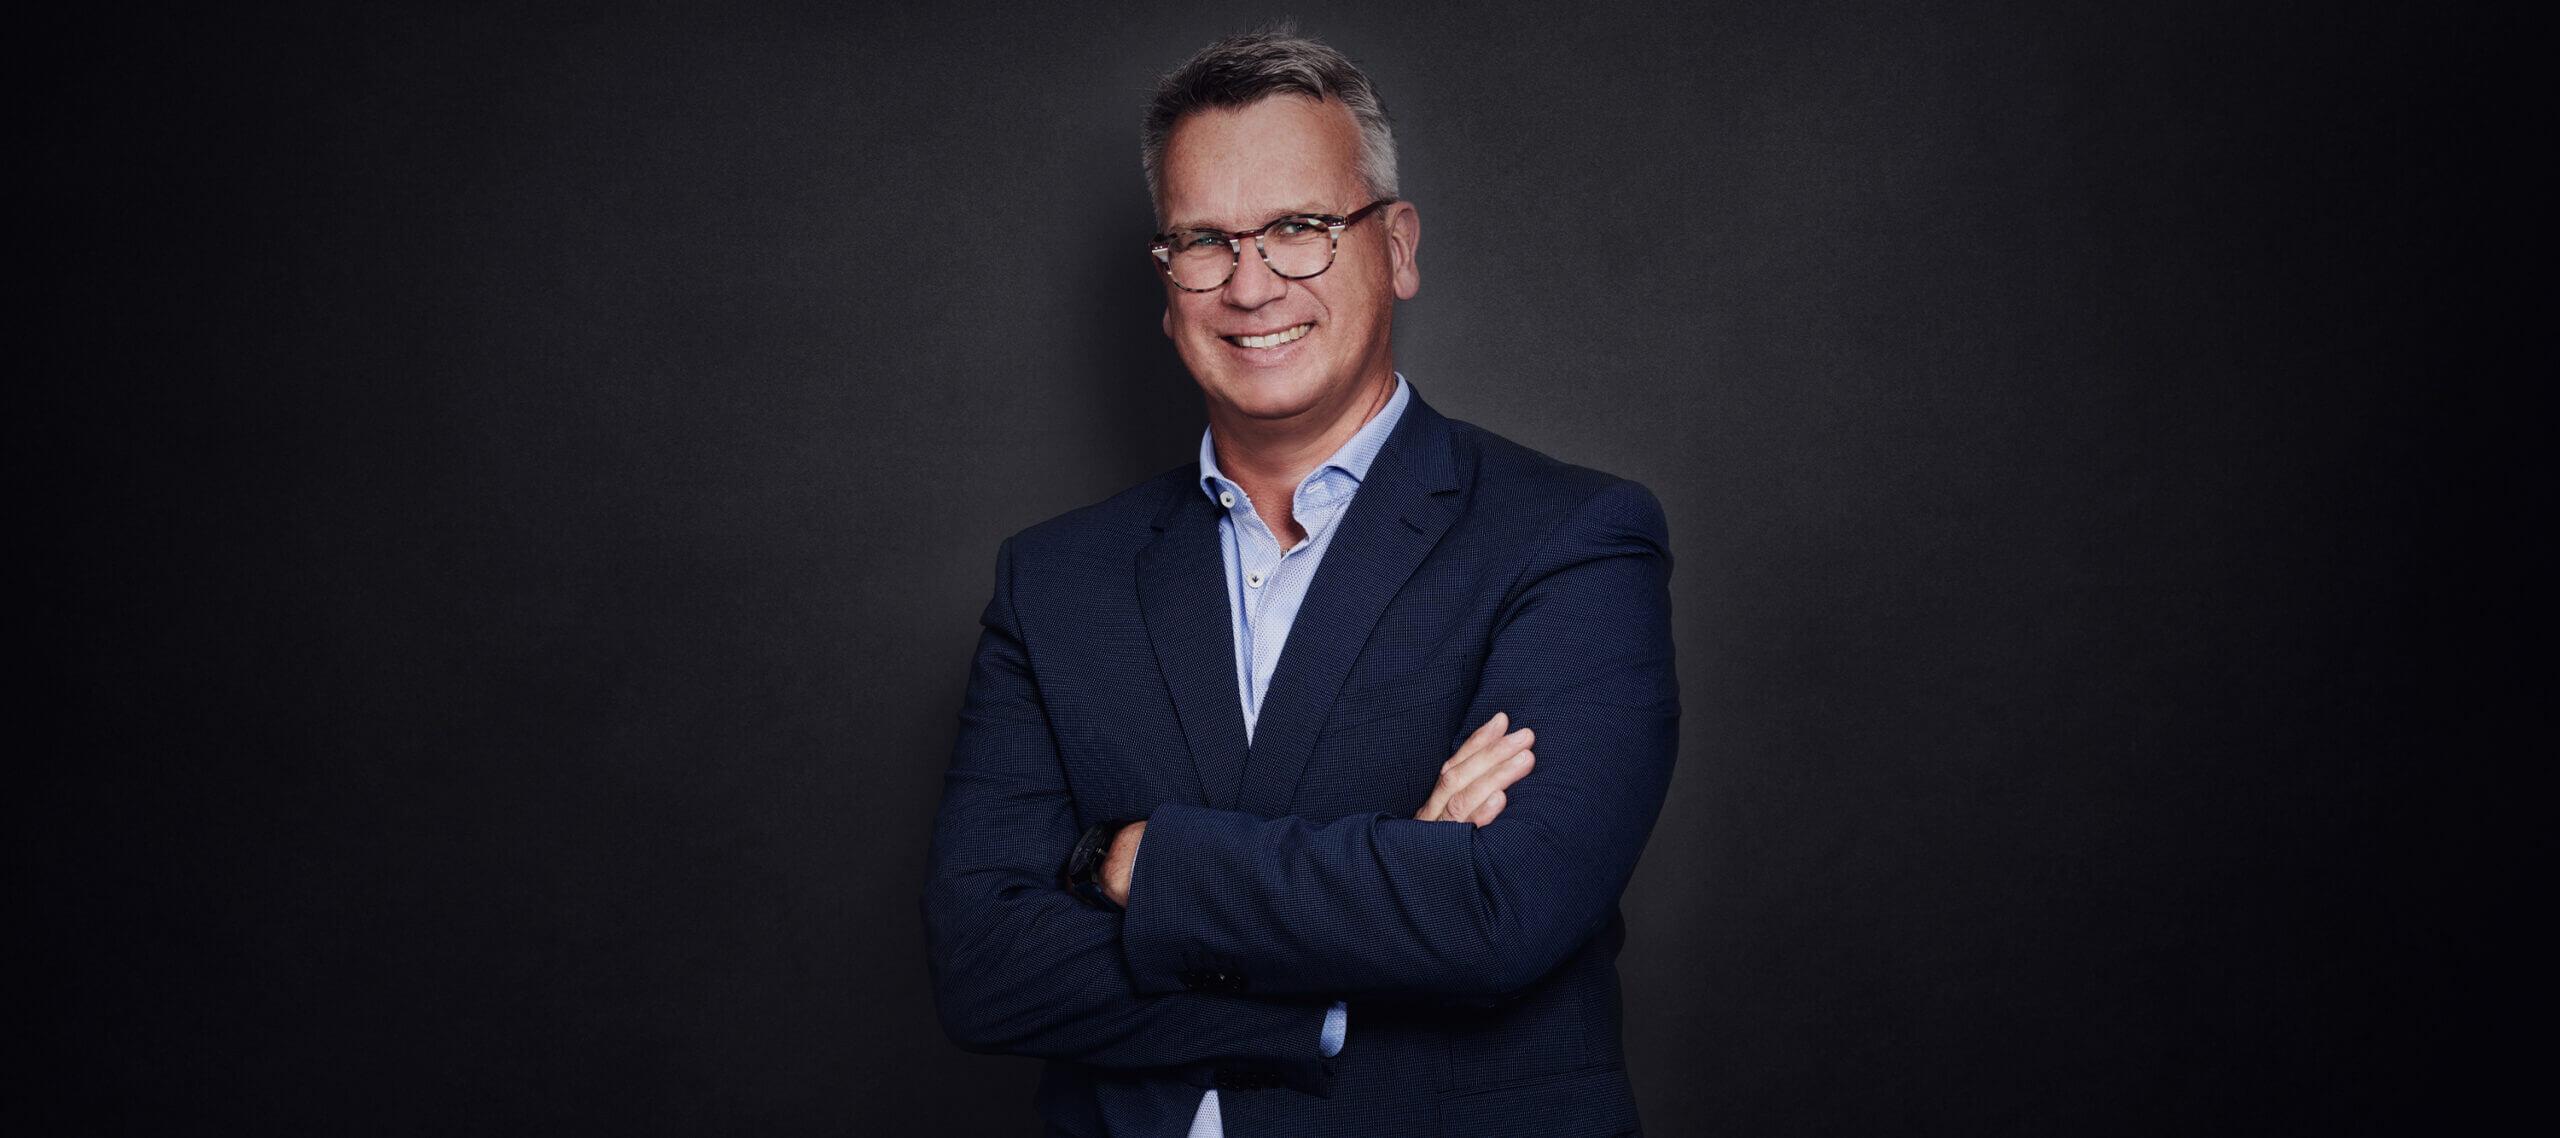 Markus Huml - Rechtsanwalt & Fachanwalt für Steuerrecht